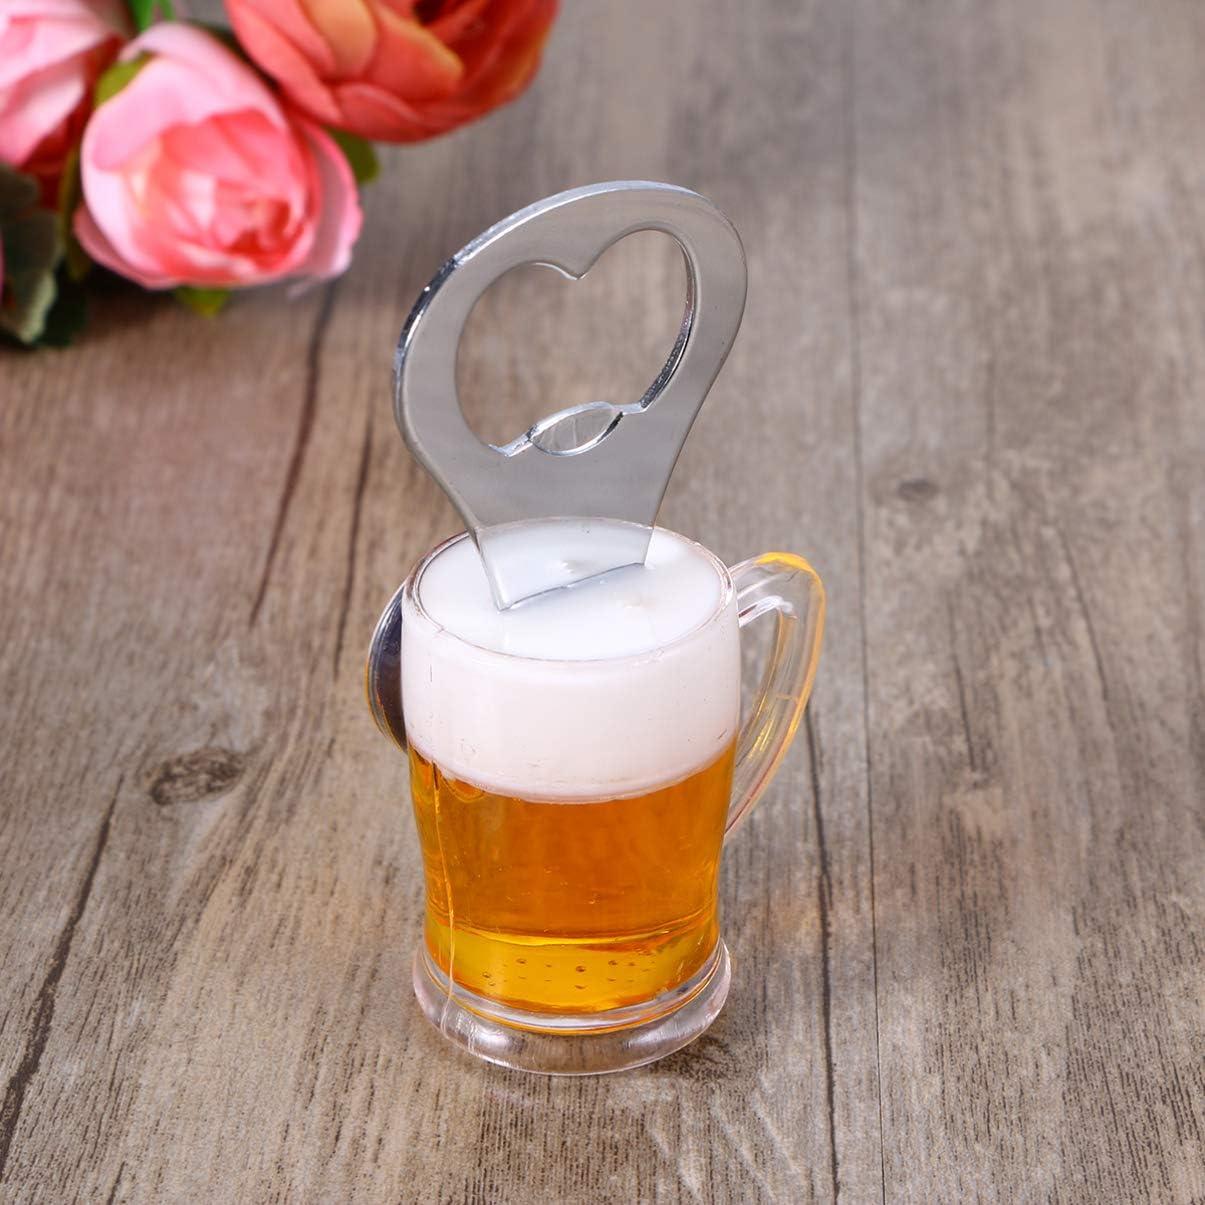 Apribottiglie magnetico da frigorifero per birra e vino TOPBATHY